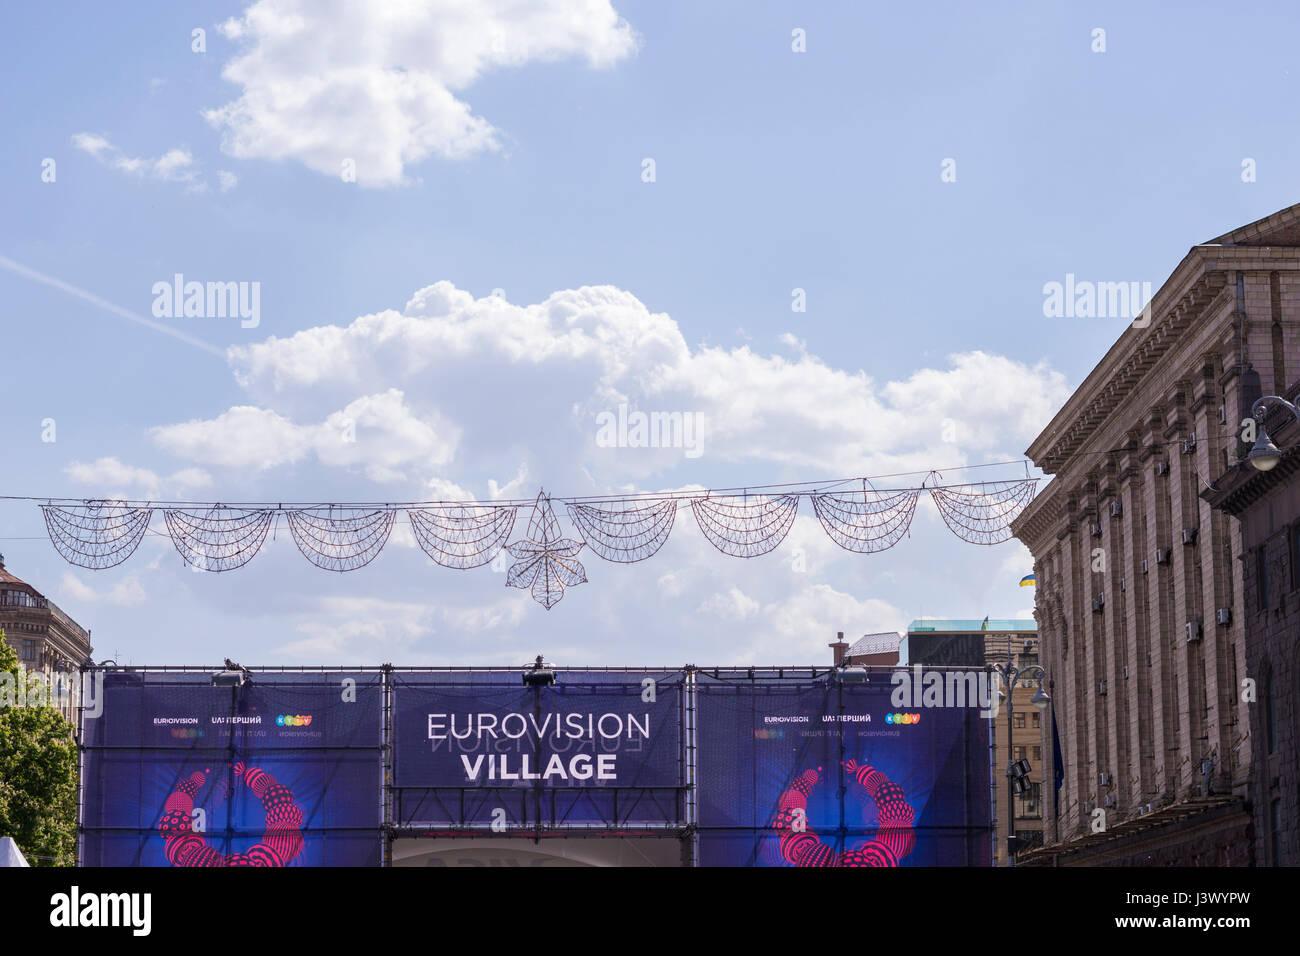 KIEV, UKRAINE - MAY 7, 2017: entrance to Eurovision Fan Zone under Blue Sky Credit: Denys Davydenko/Alamy Live News - Stock Image